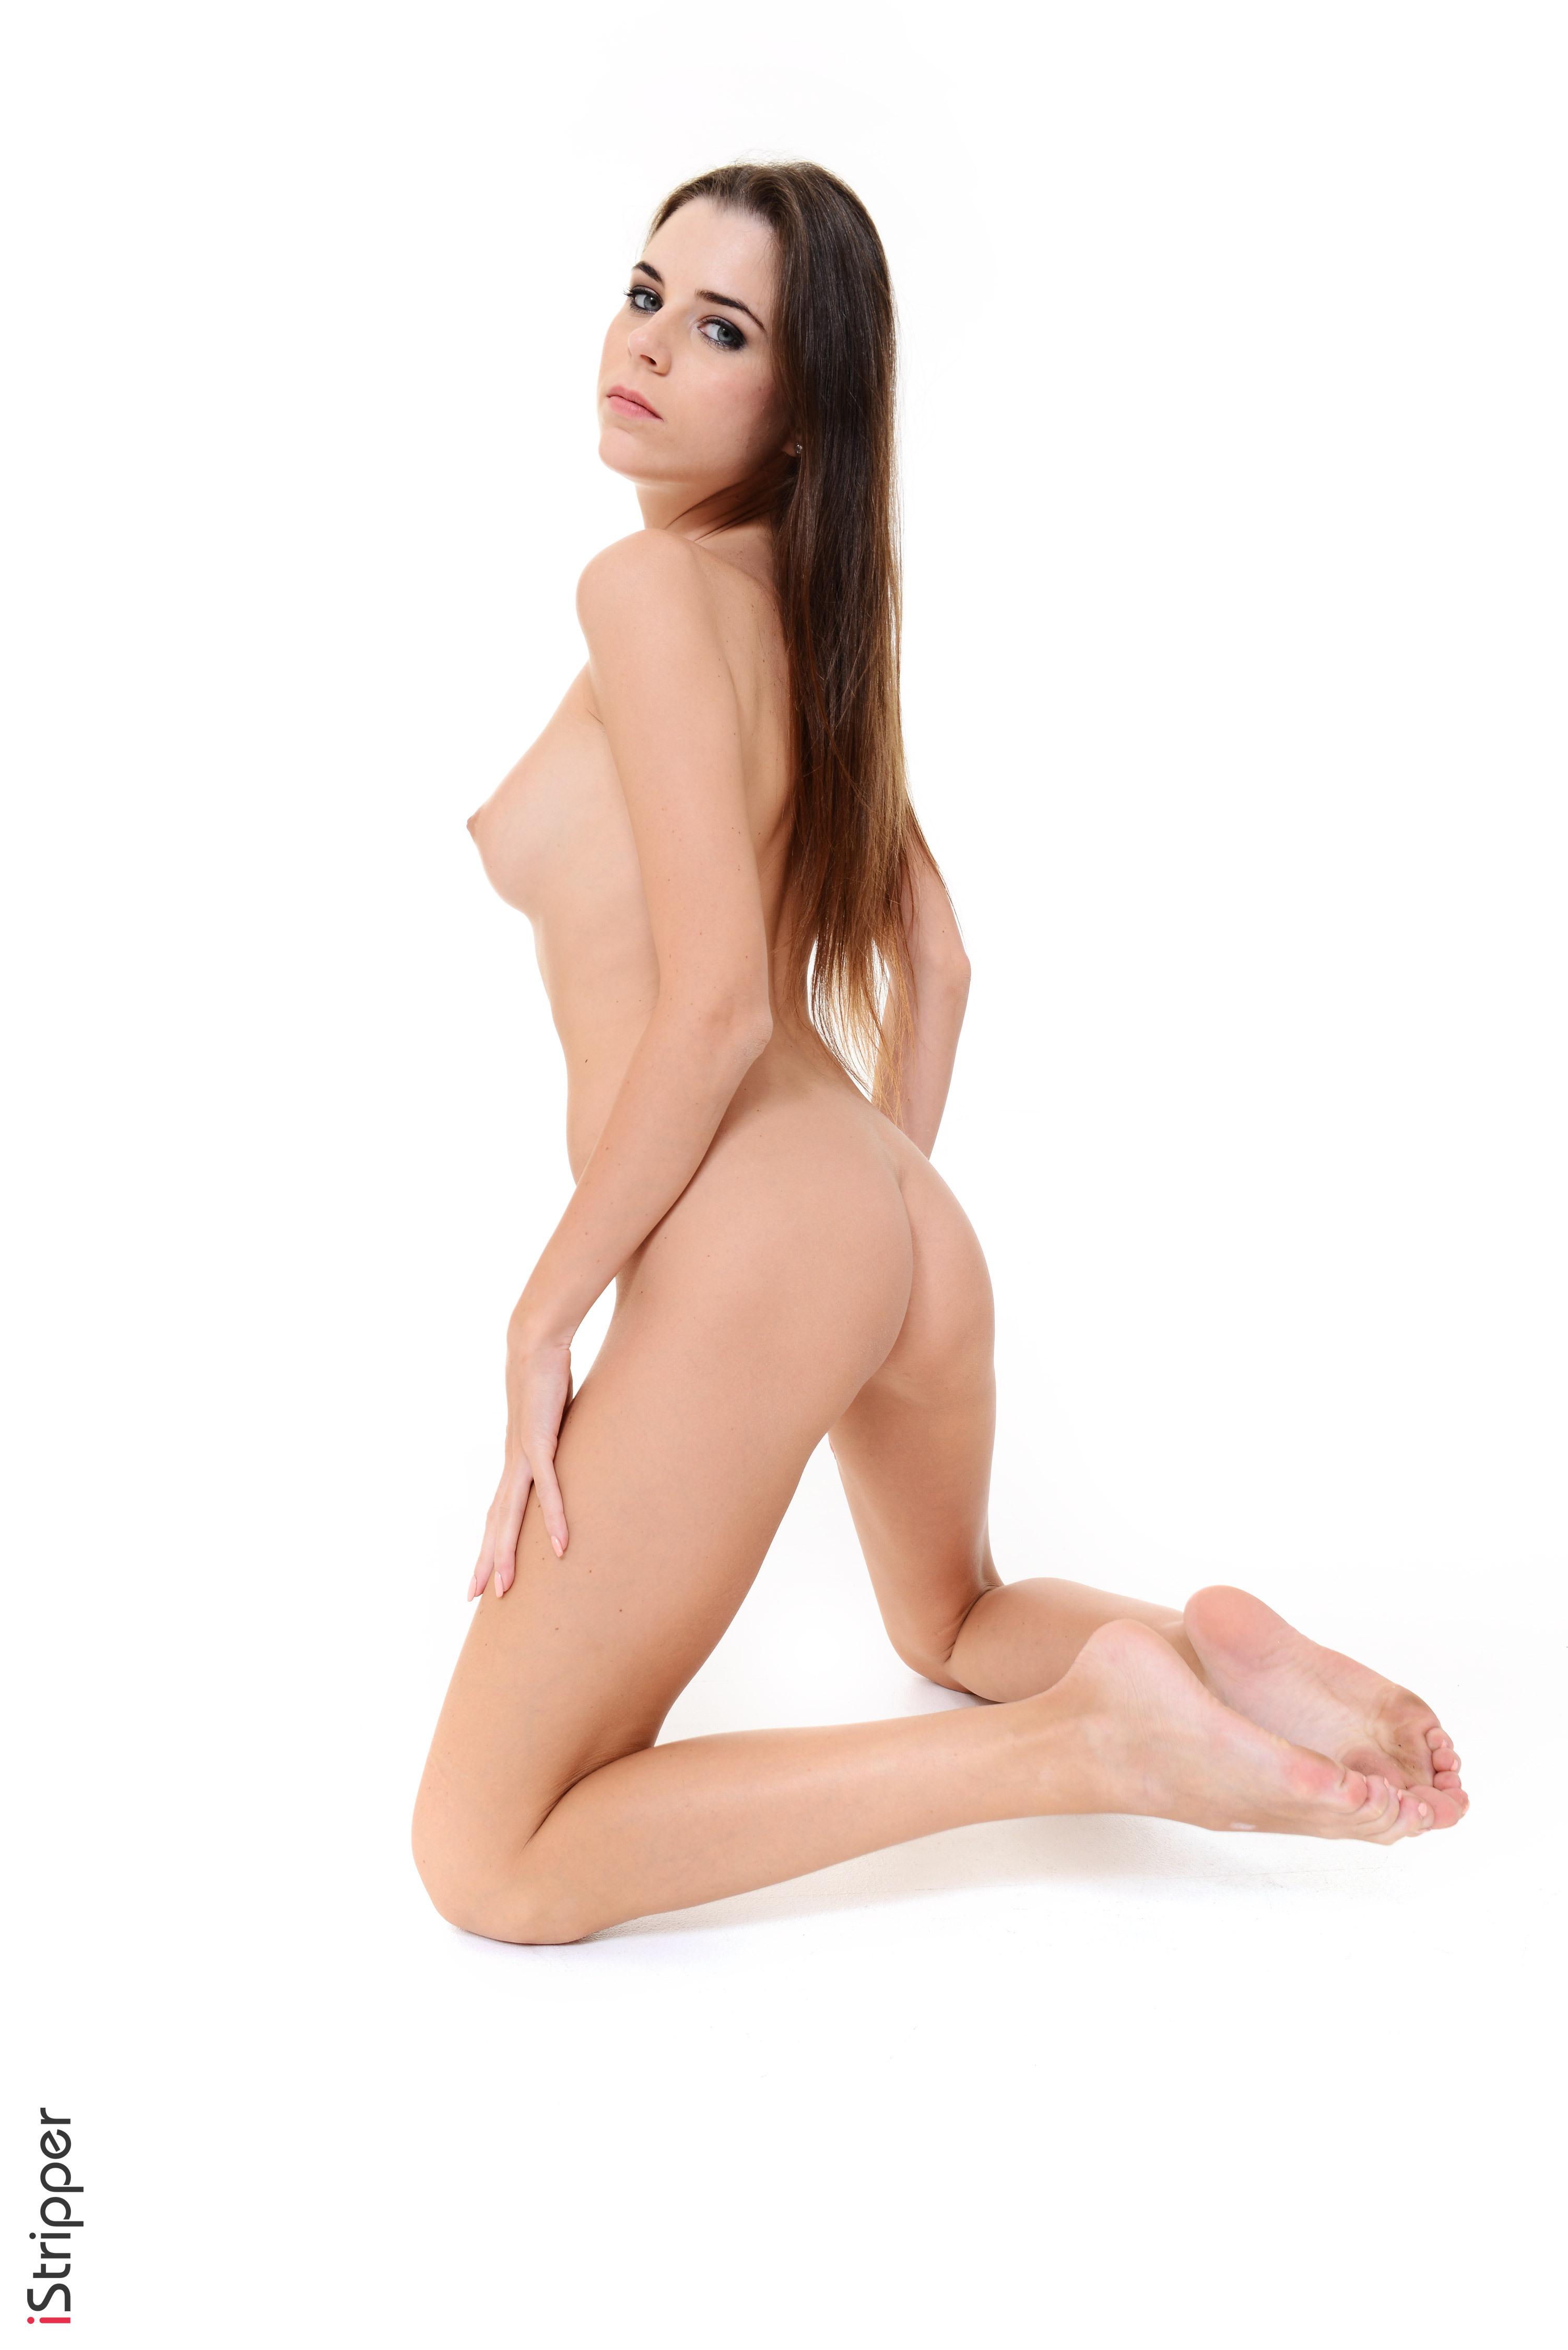 wallpapers naked girl